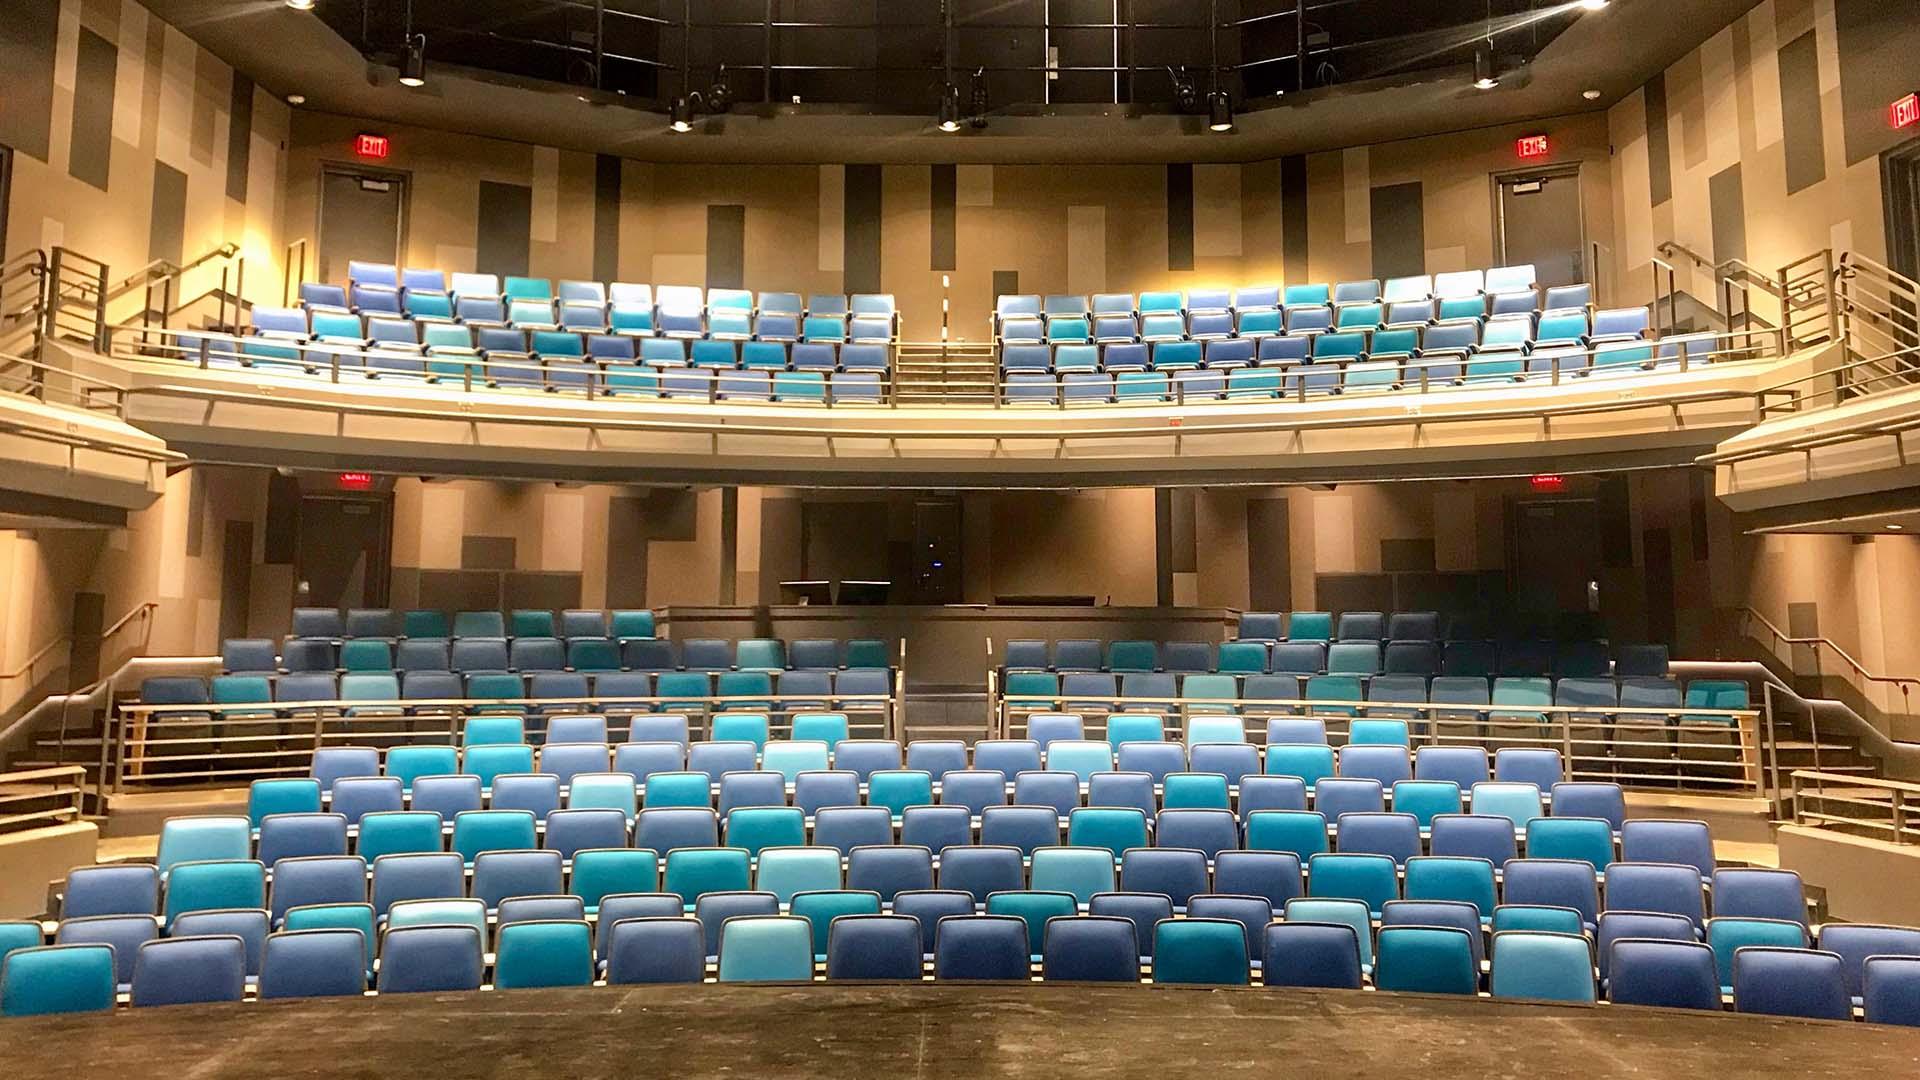 SC Children's Theatre